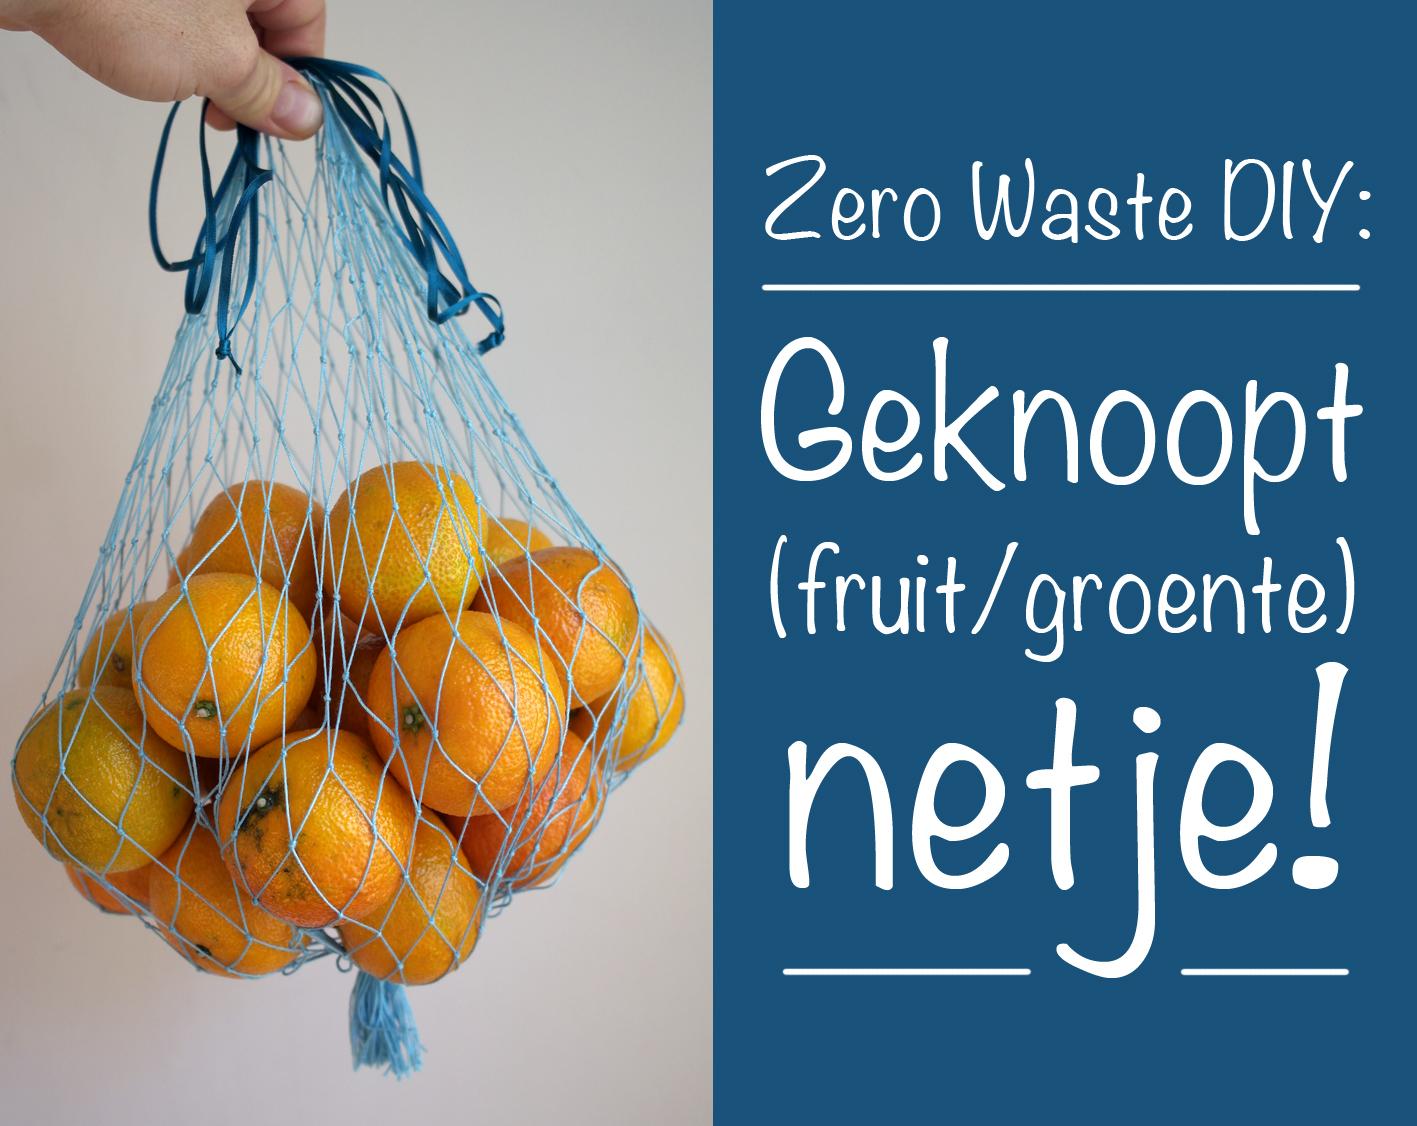 Dmmu Zero Waste Diy Geknoopt Fruitgroente Netje